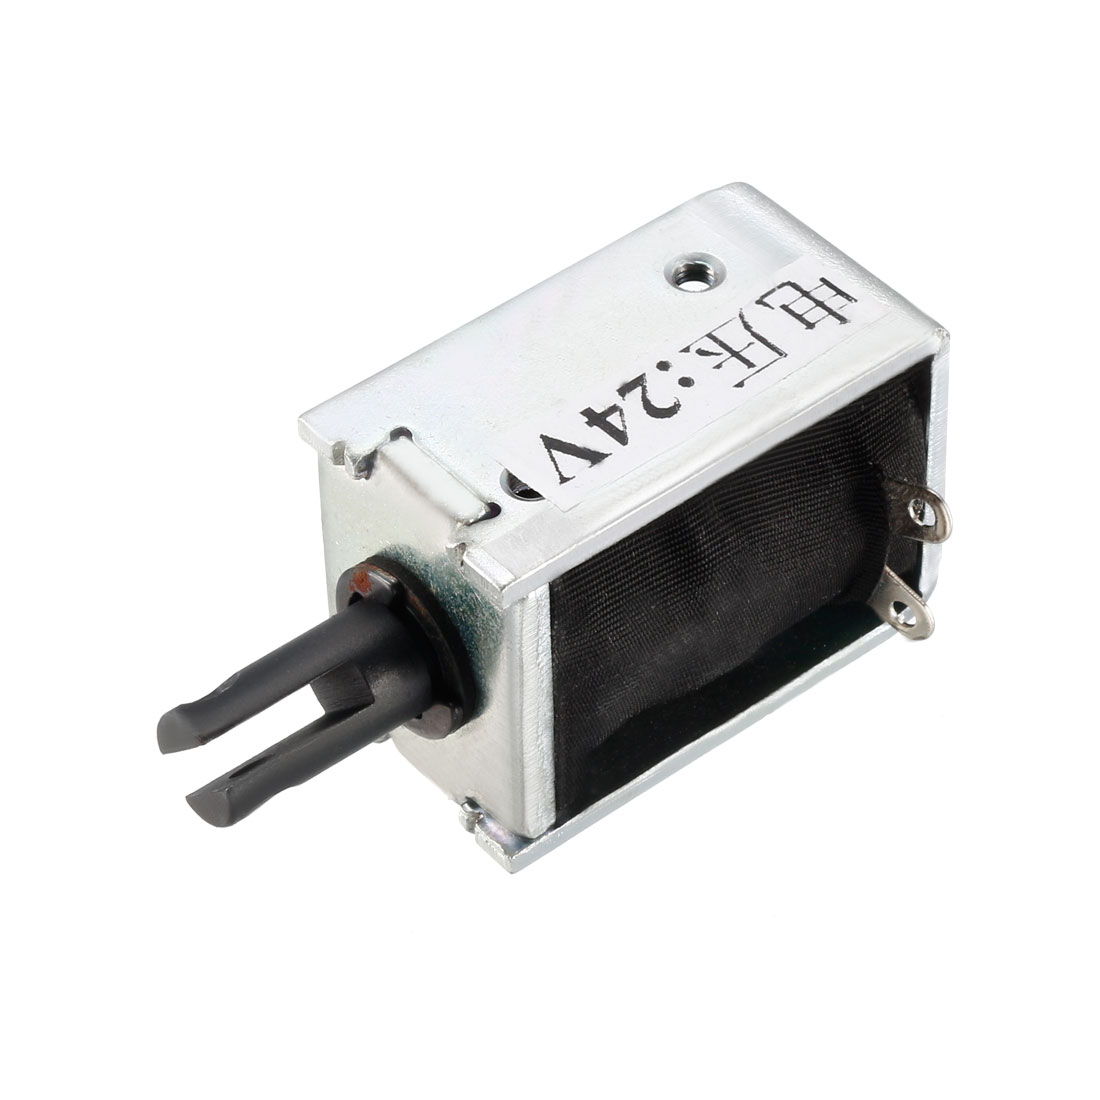 Uxcell DC 24V 15N 6mm Pull Type Solenoid Electromagnet, Open Frame, Linear Motion